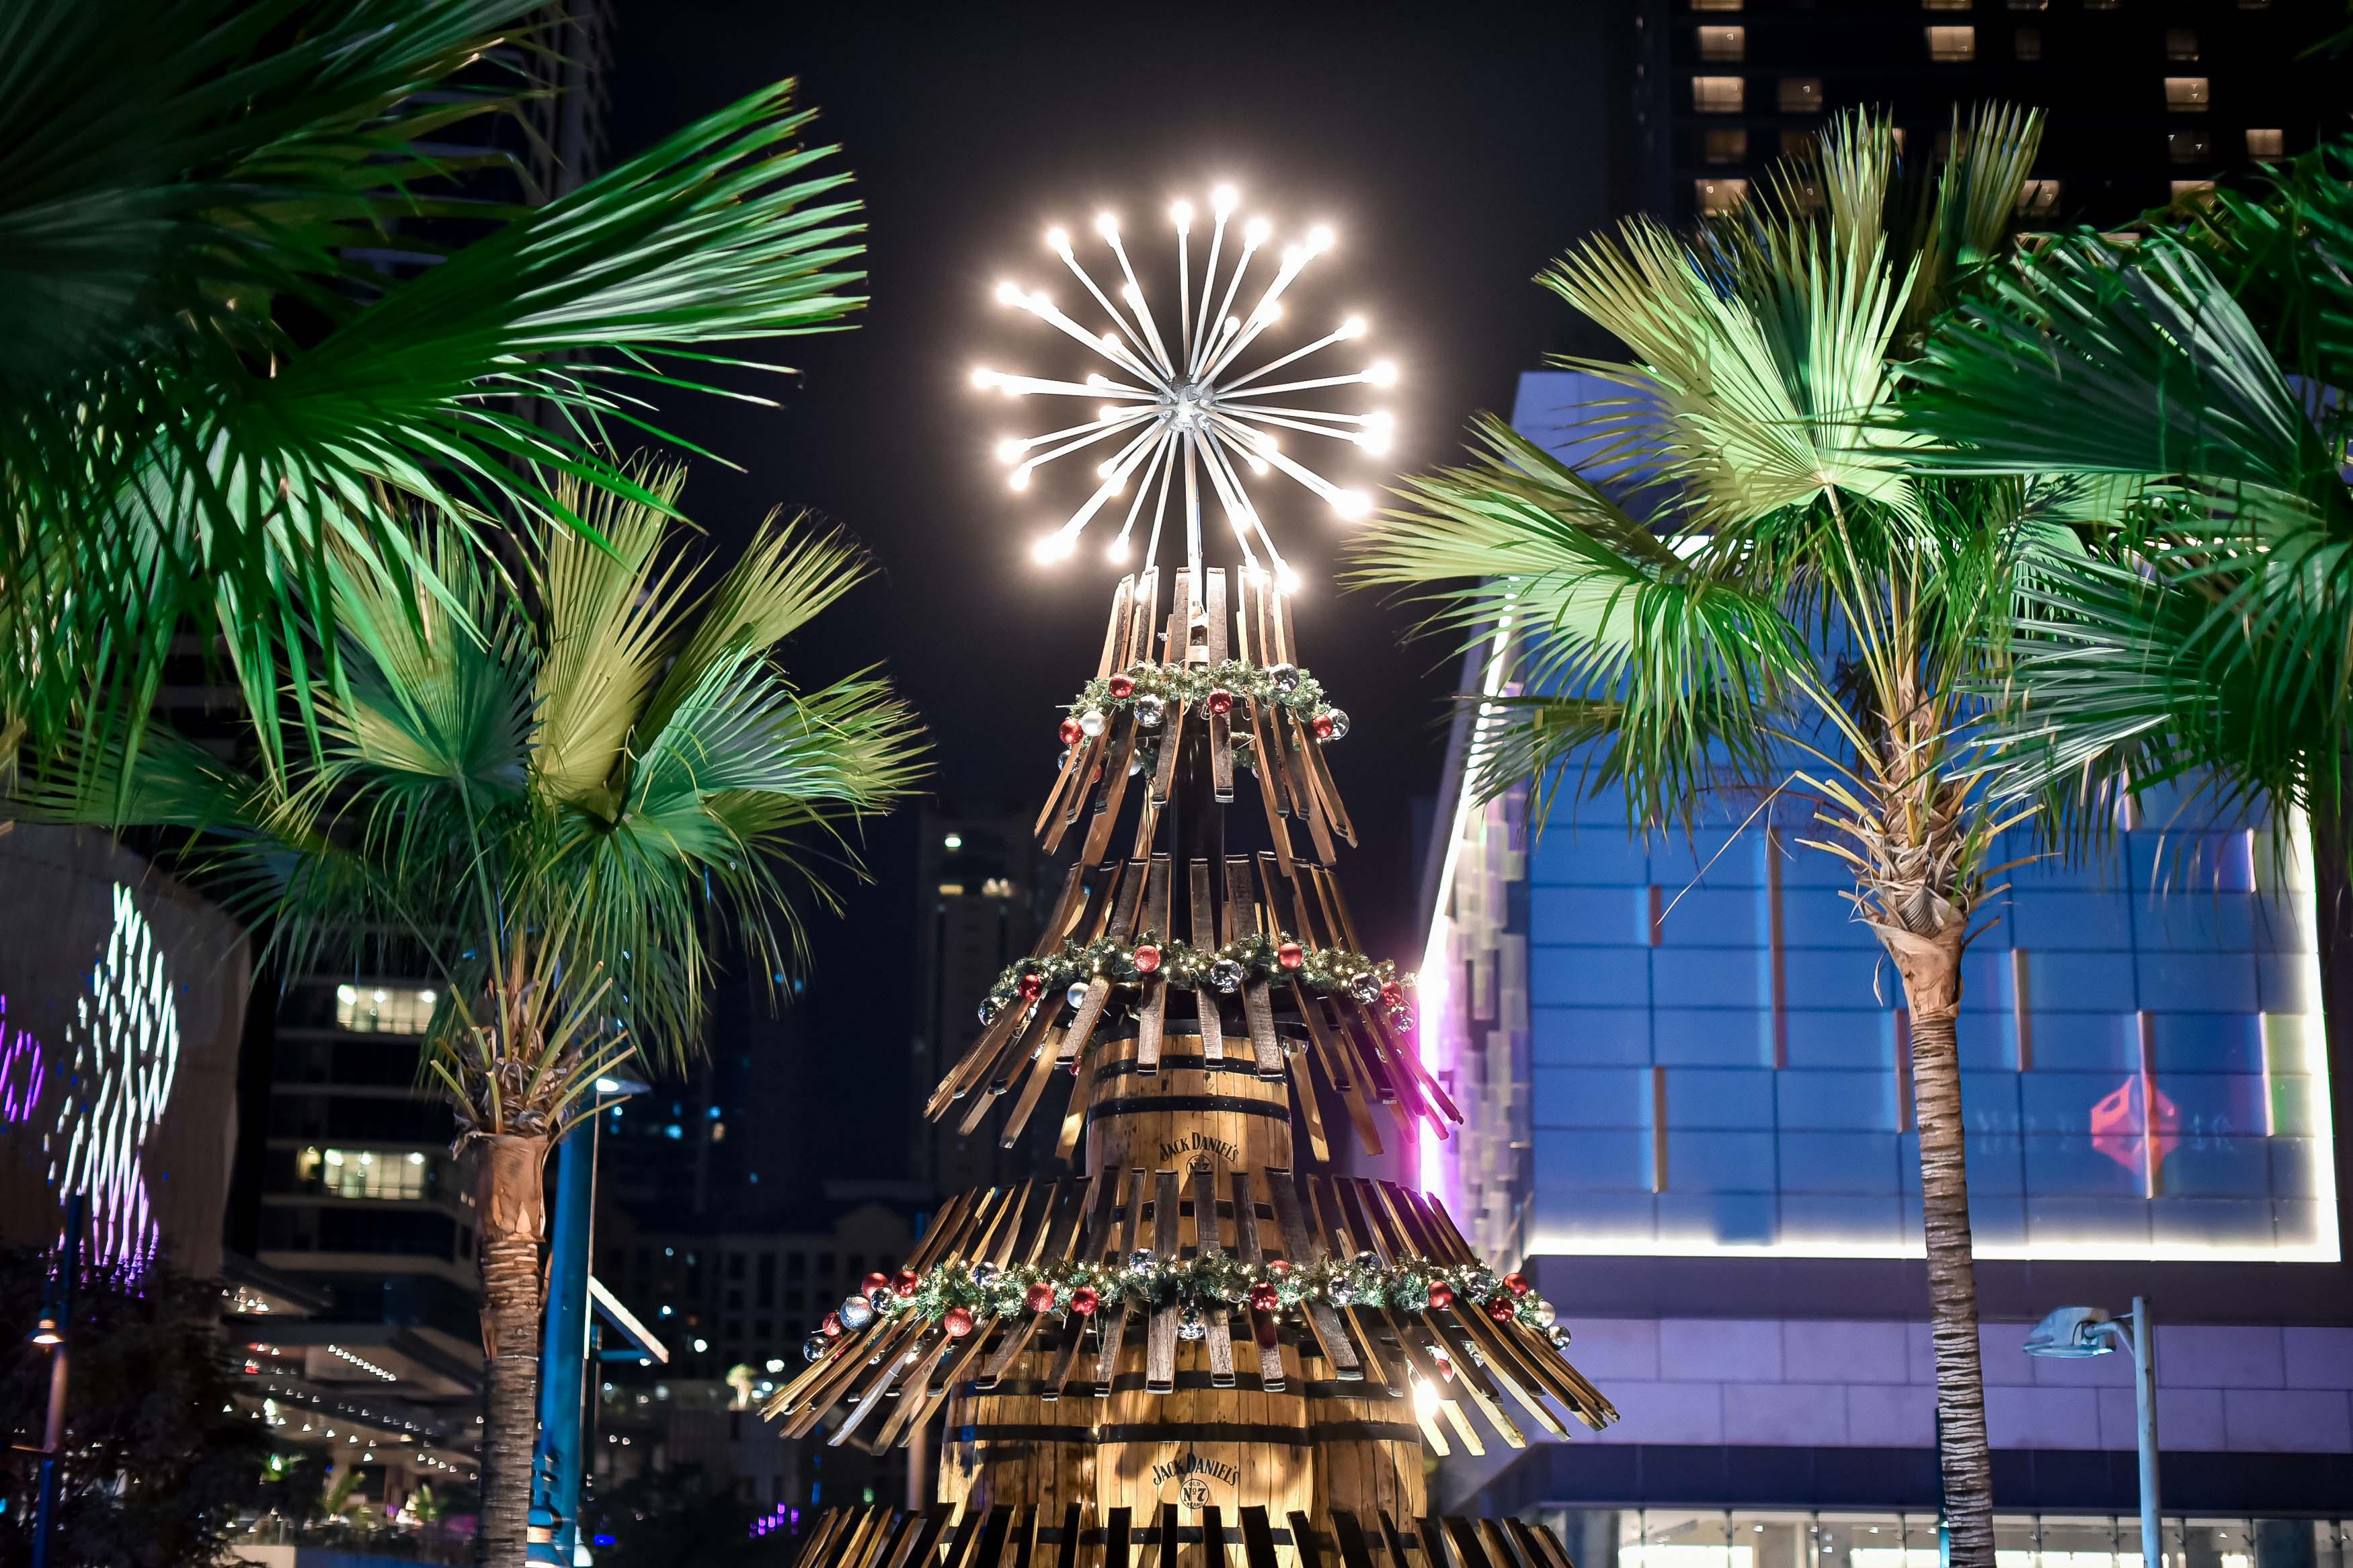 Jack Daniel's Holiday Barrel Tree (1)